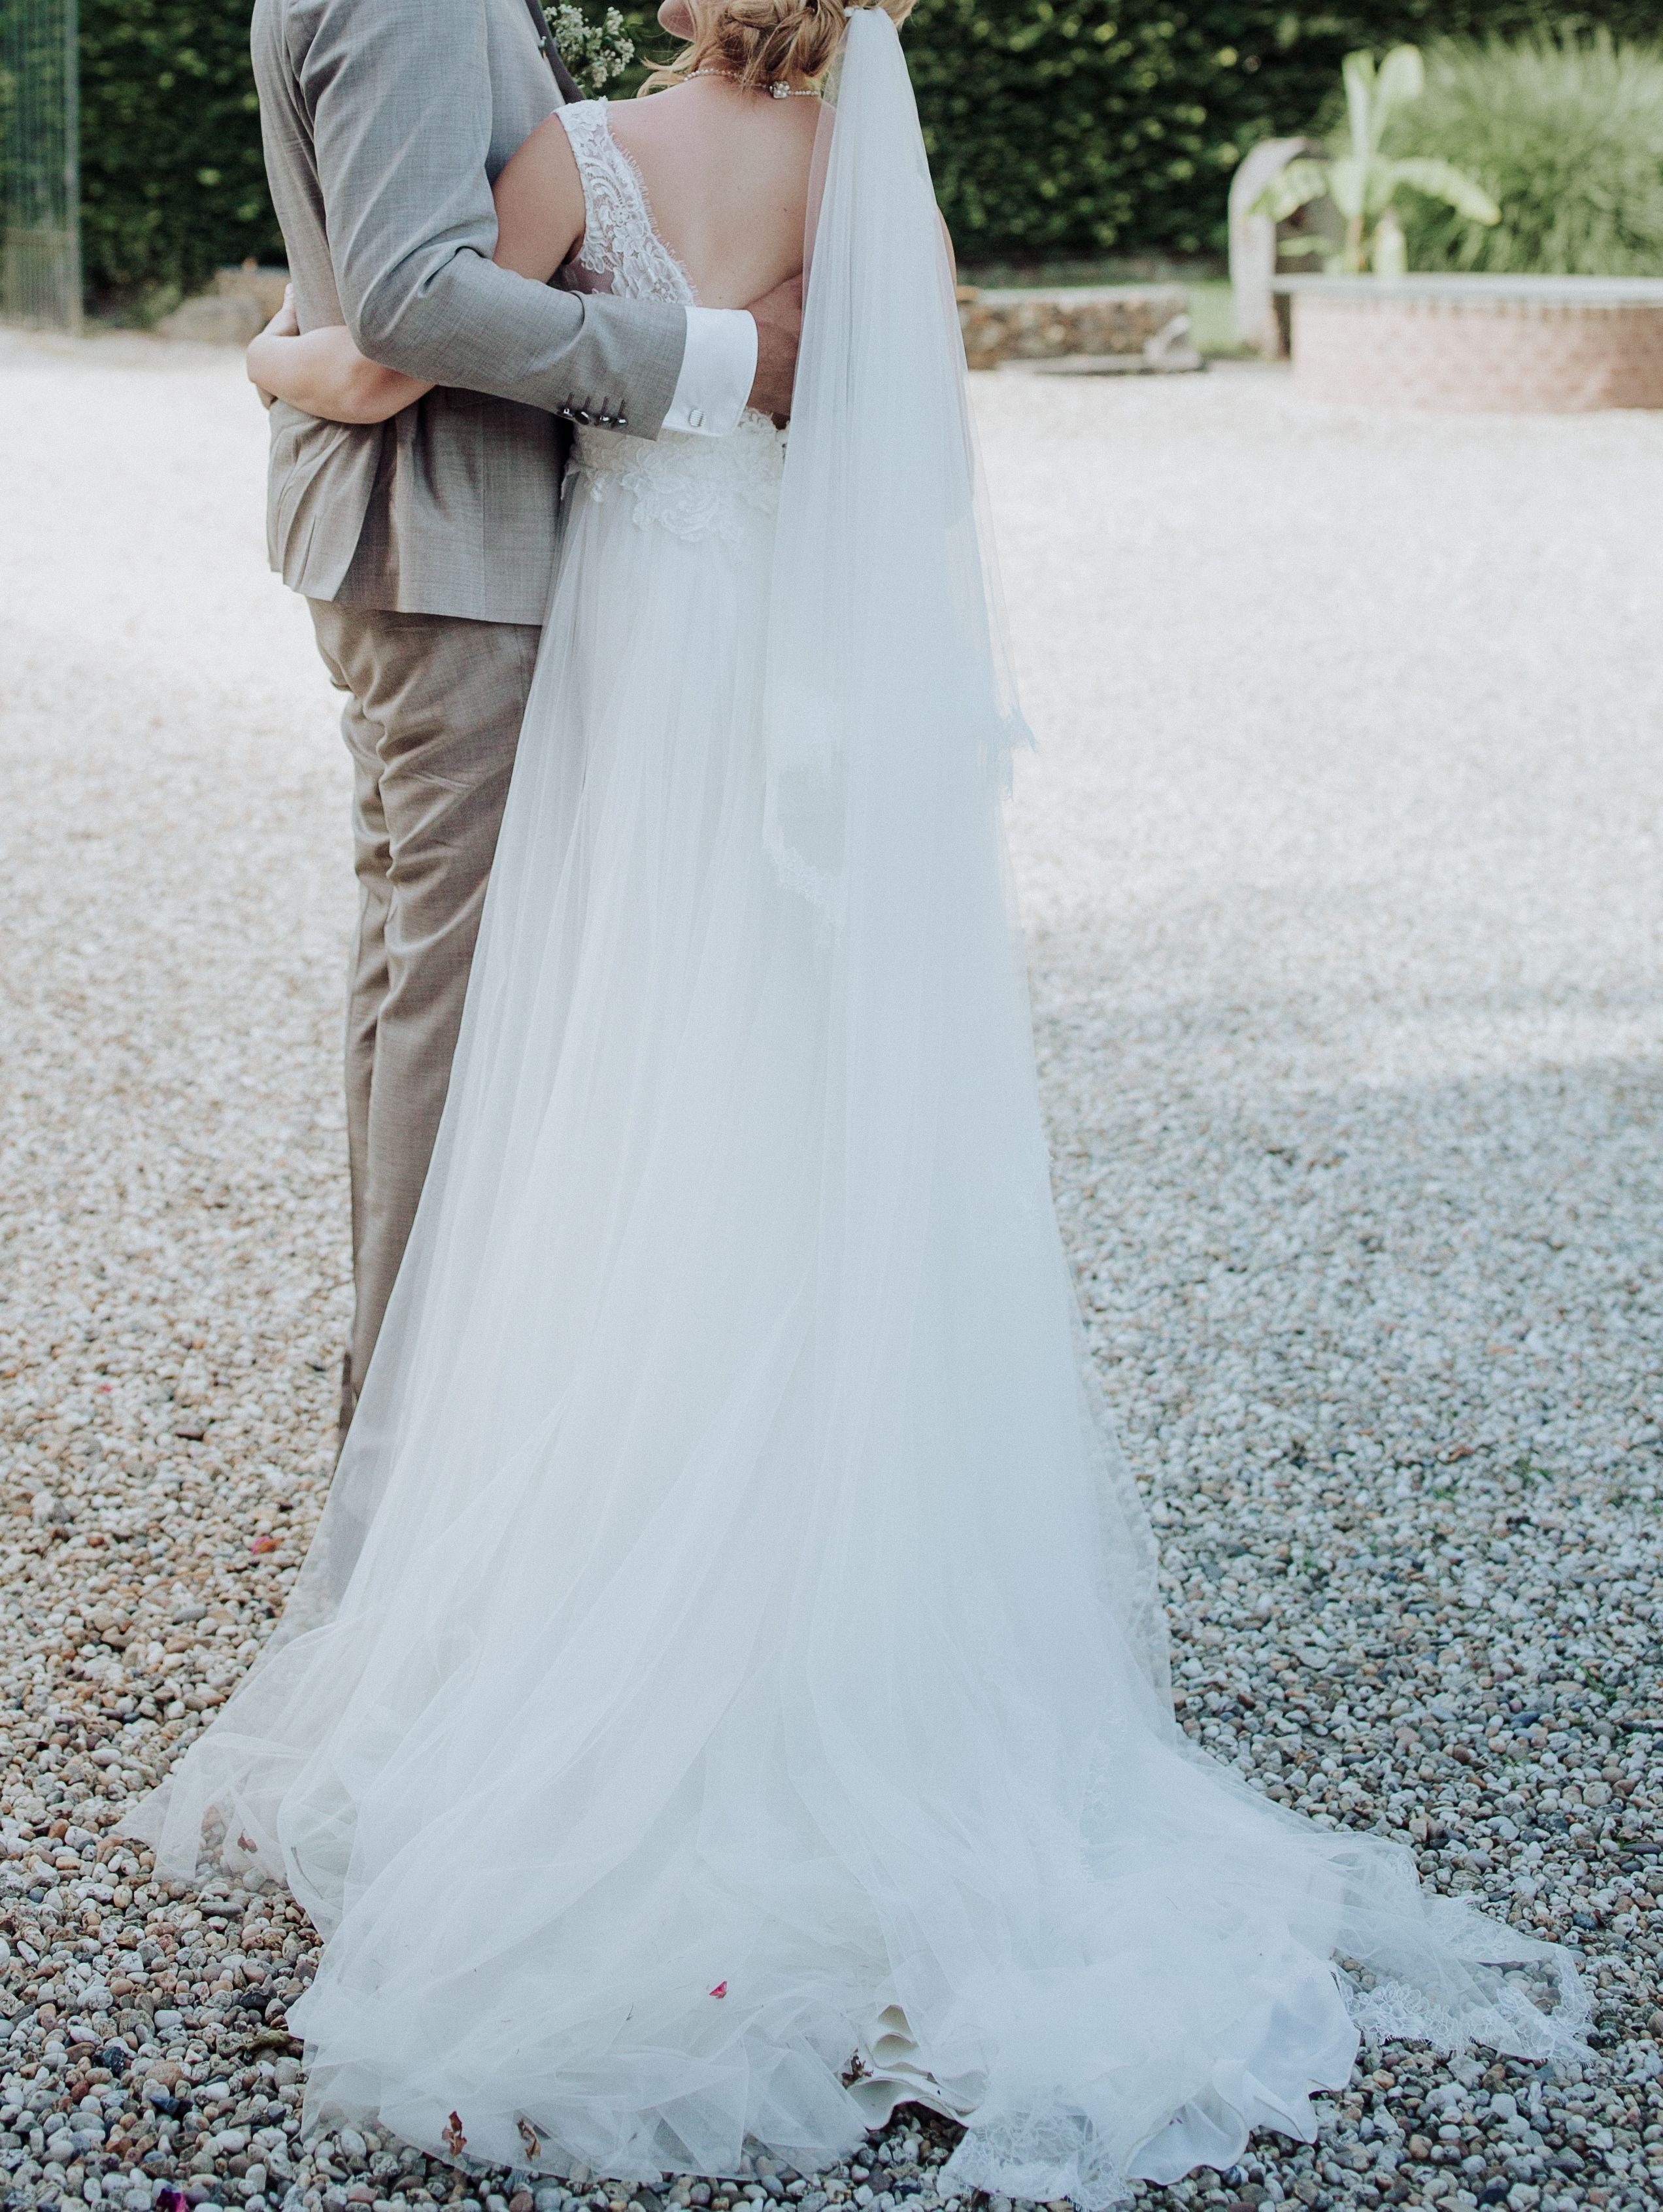 Nice Ashlee Simpson Wedding Gown Gift - Wedding and flowers ...